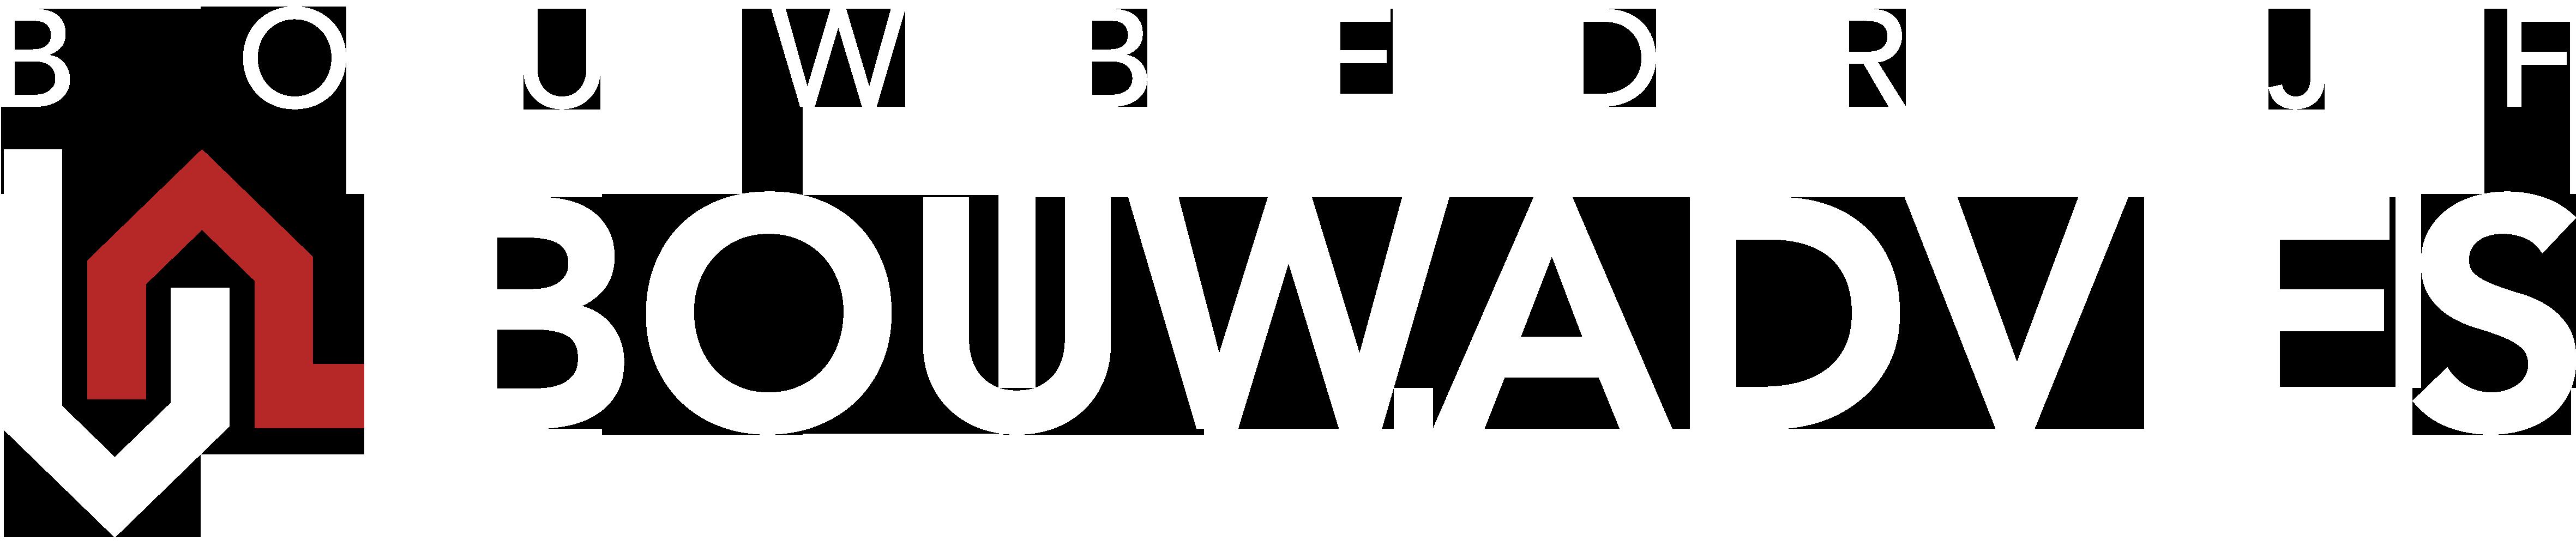 Bouwbedrijf Bouwadvies